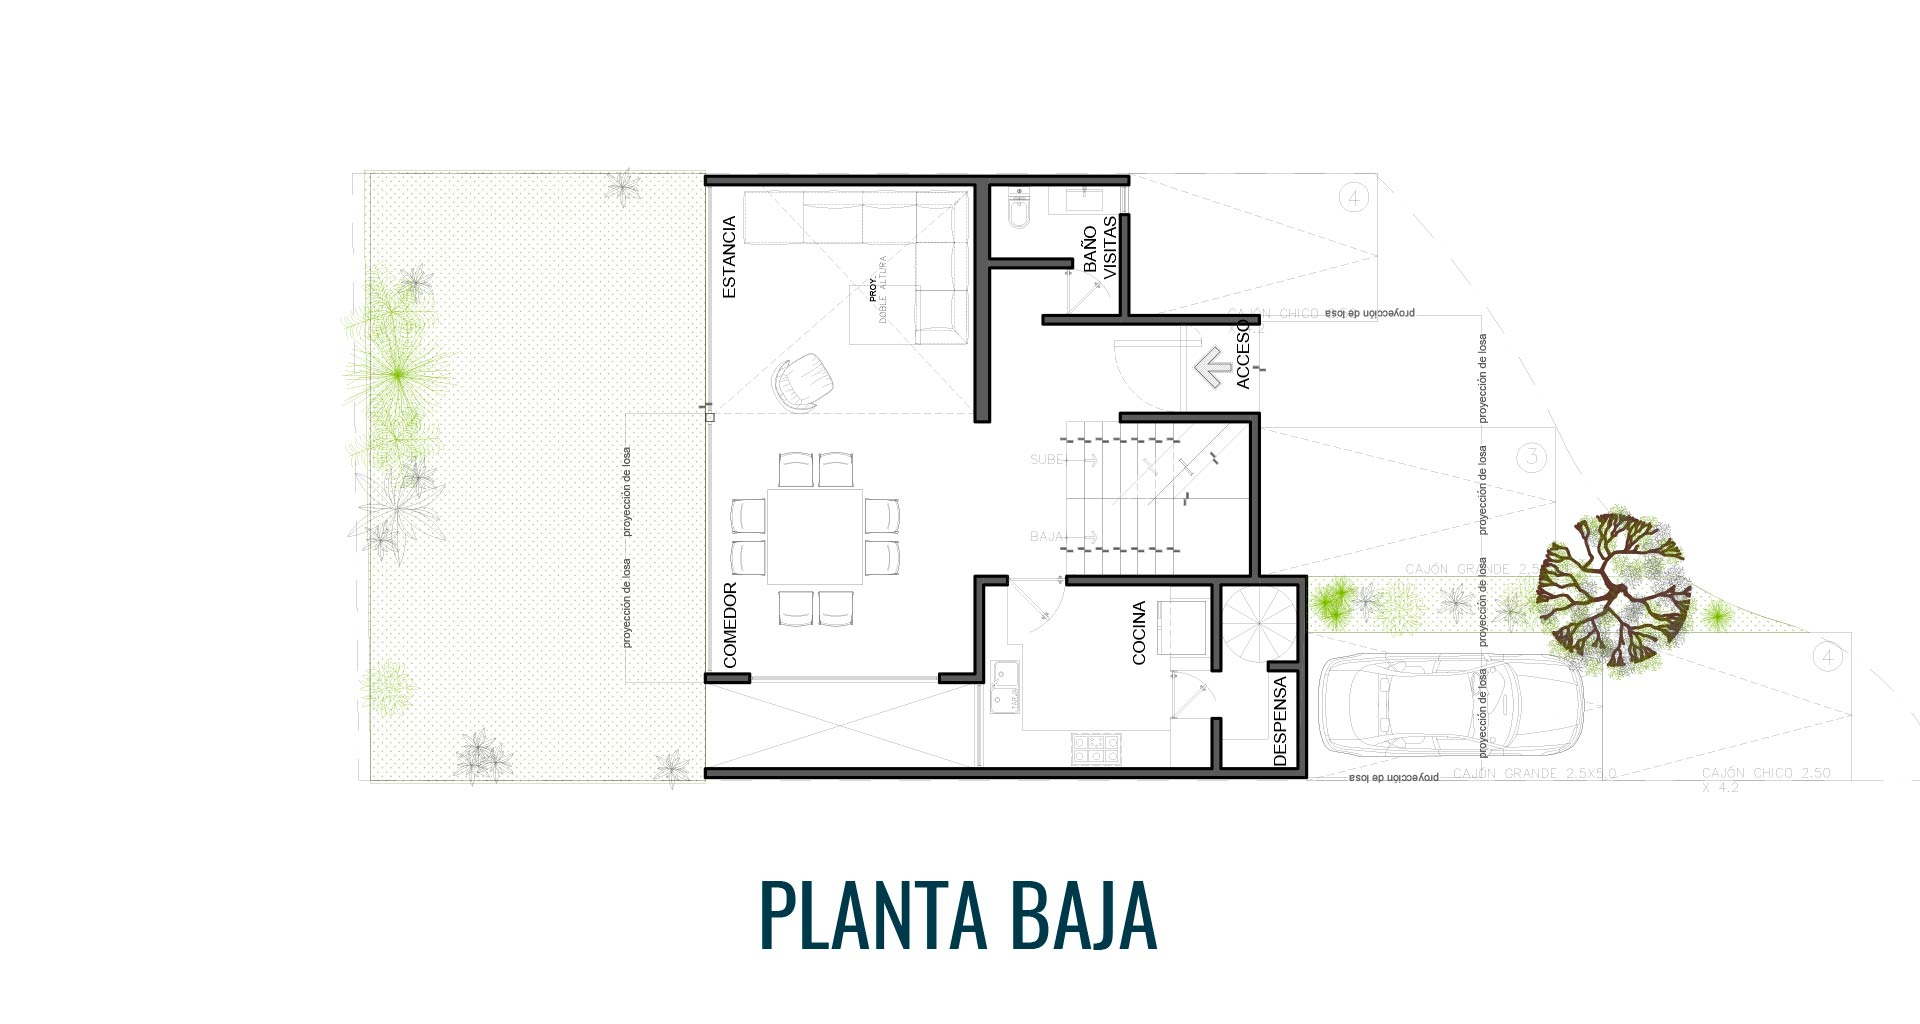 Margaritas 339 residencial Mexihom Residencia 2 planta baja